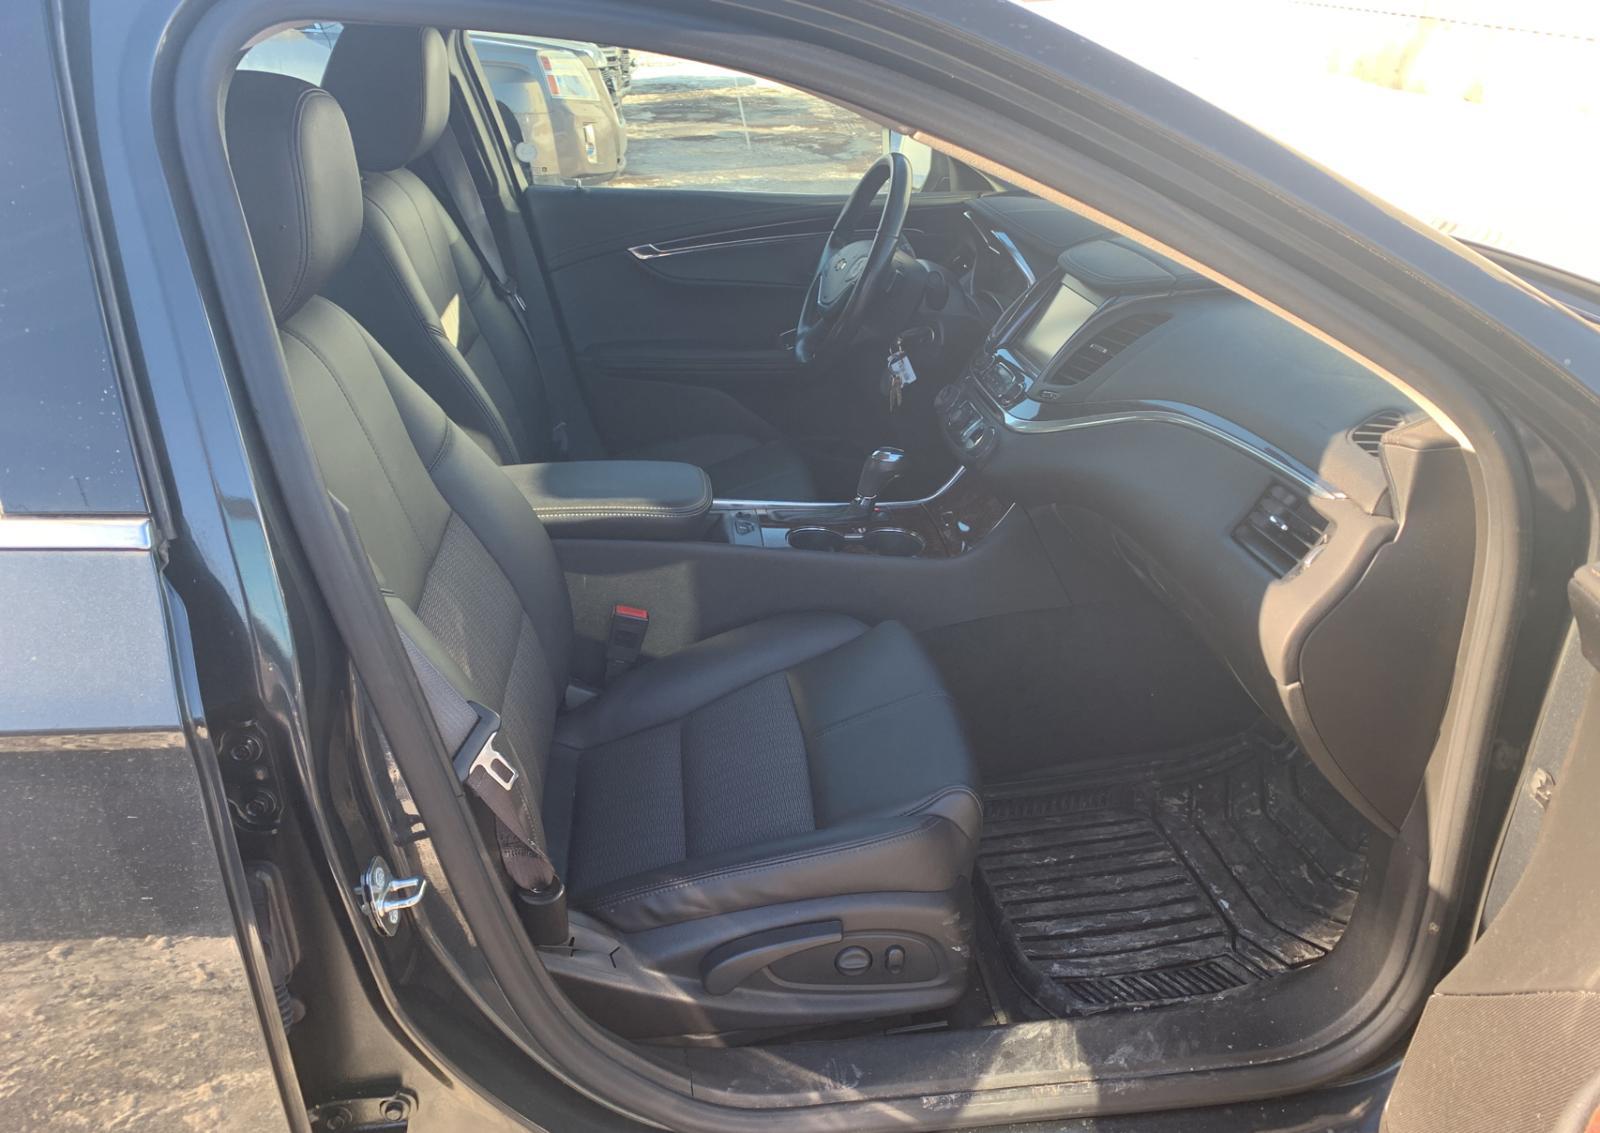 2G1125S37F9185464 - 2015 Chevrolet Impala Lt 3.6L close up View